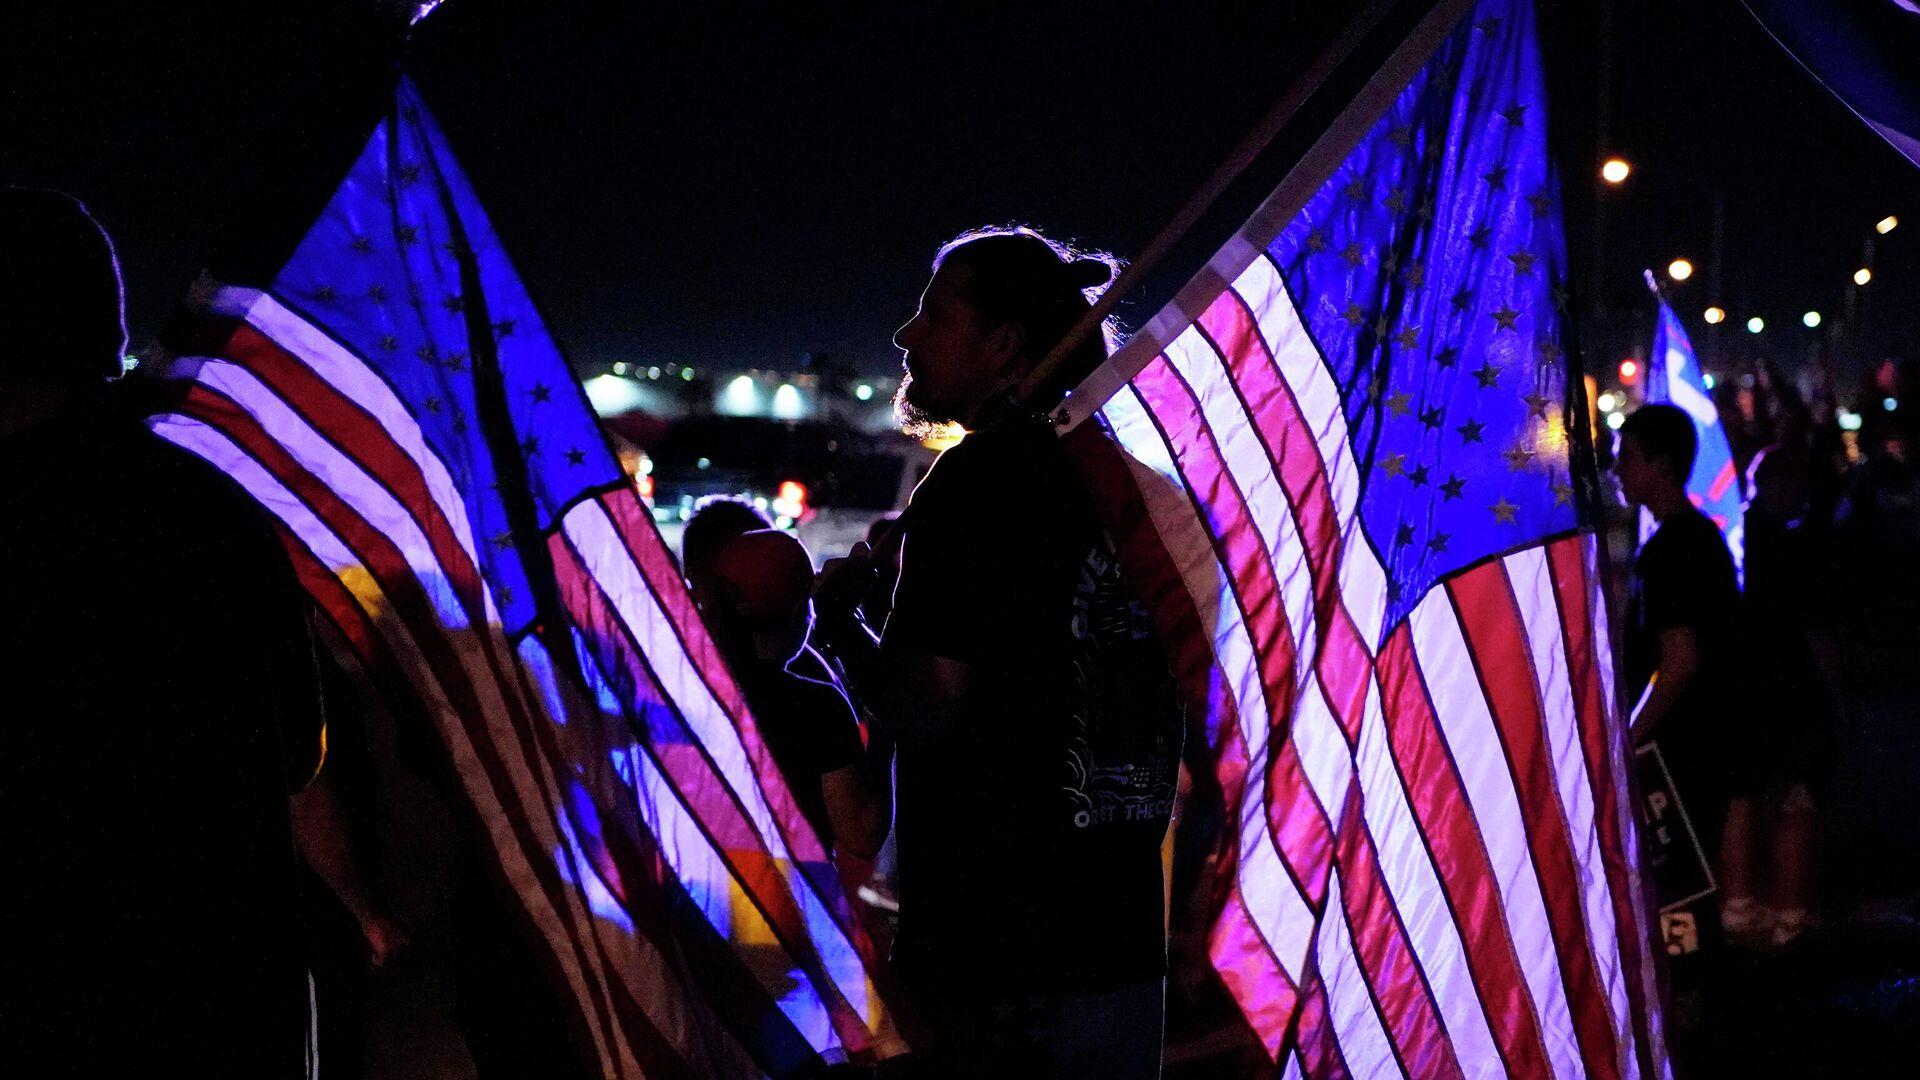 Сторонник президента Дональда Трампа во время акции протест в Лас-Вегасе - РИА Новости, 1920, 08.11.2020